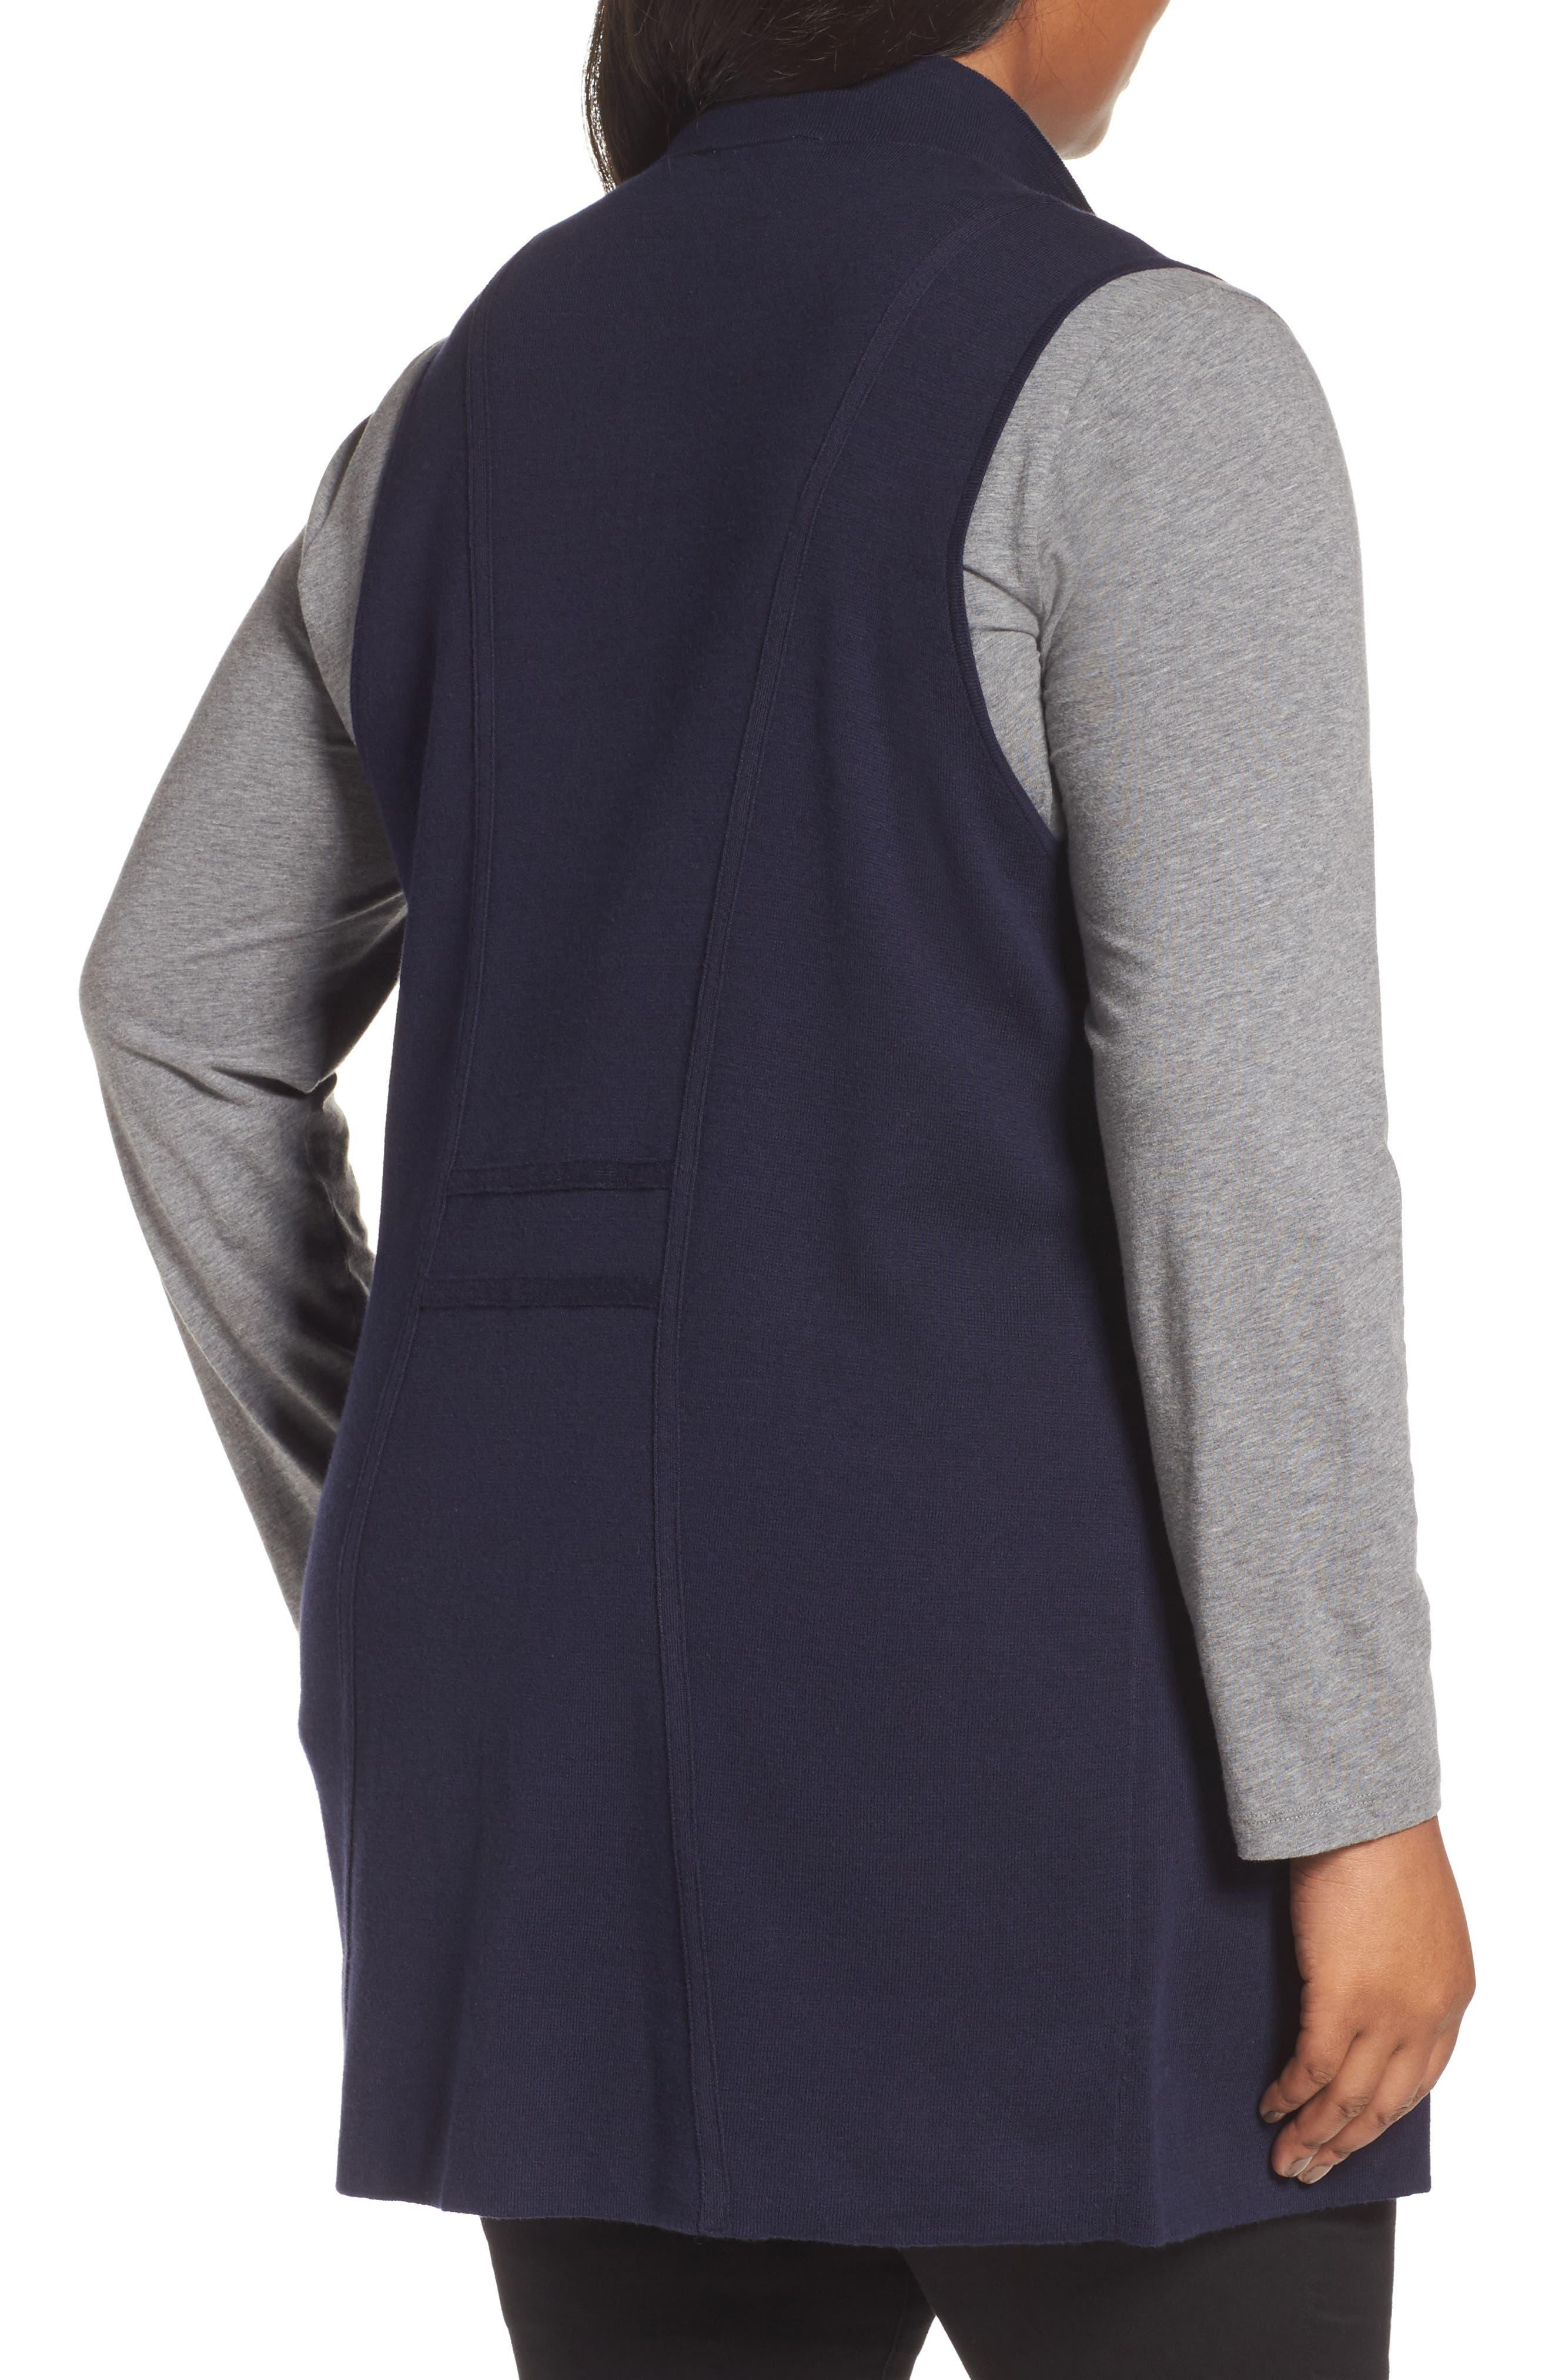 Alternate Image 2  - Foxcroft Jodi Longline Sweater Vest (Plus Size)